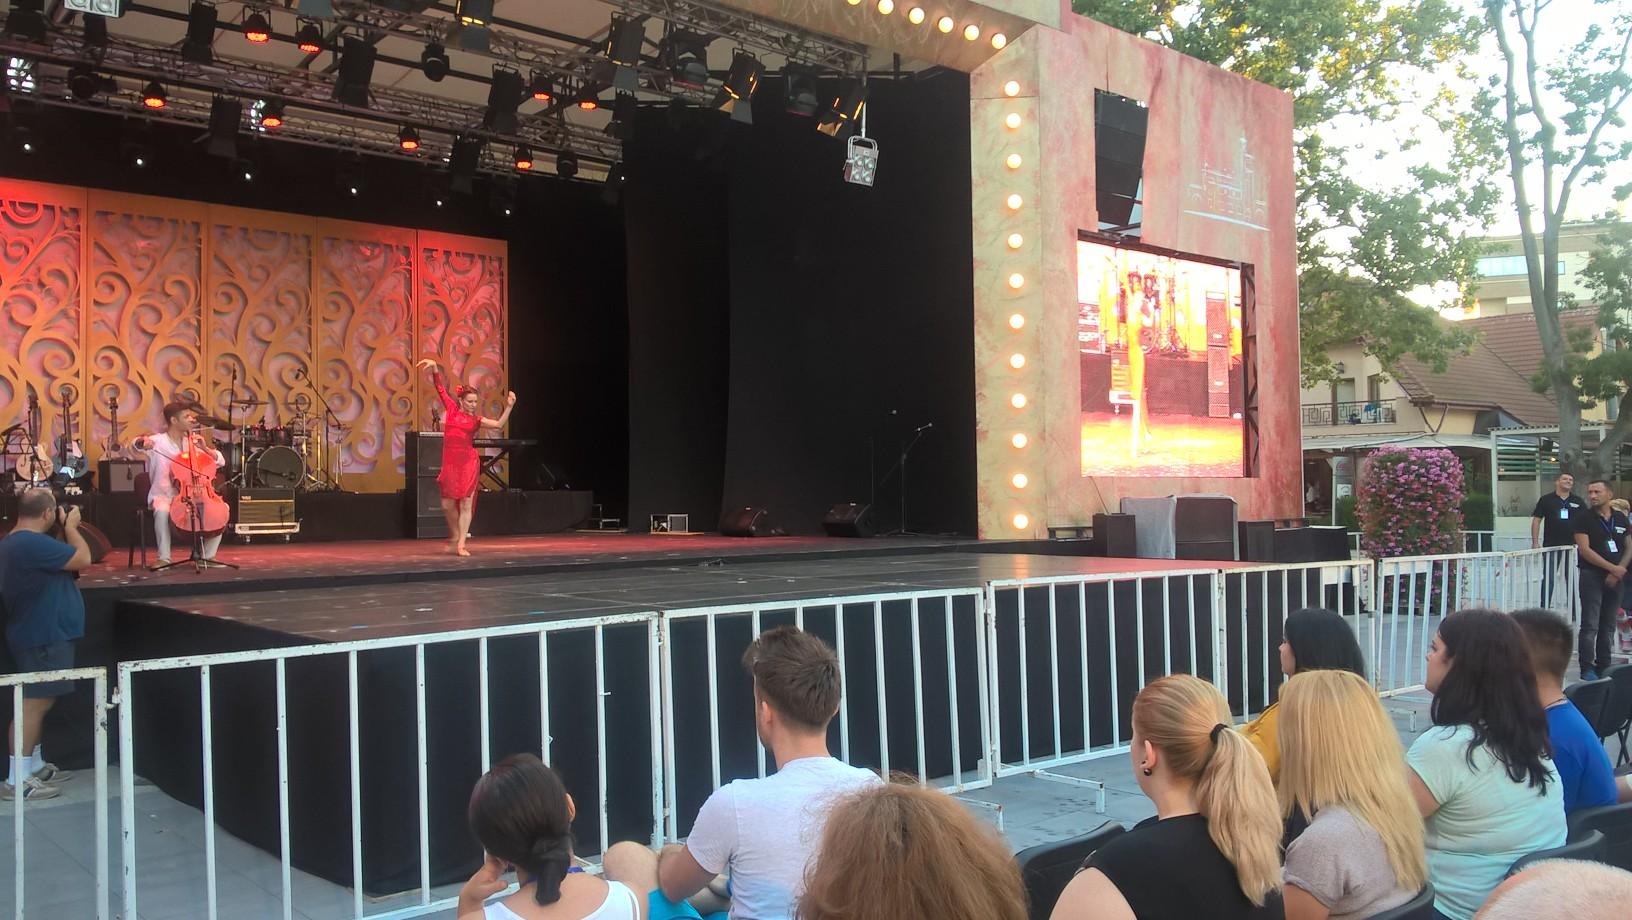 festivalul verii carusel cooltural2